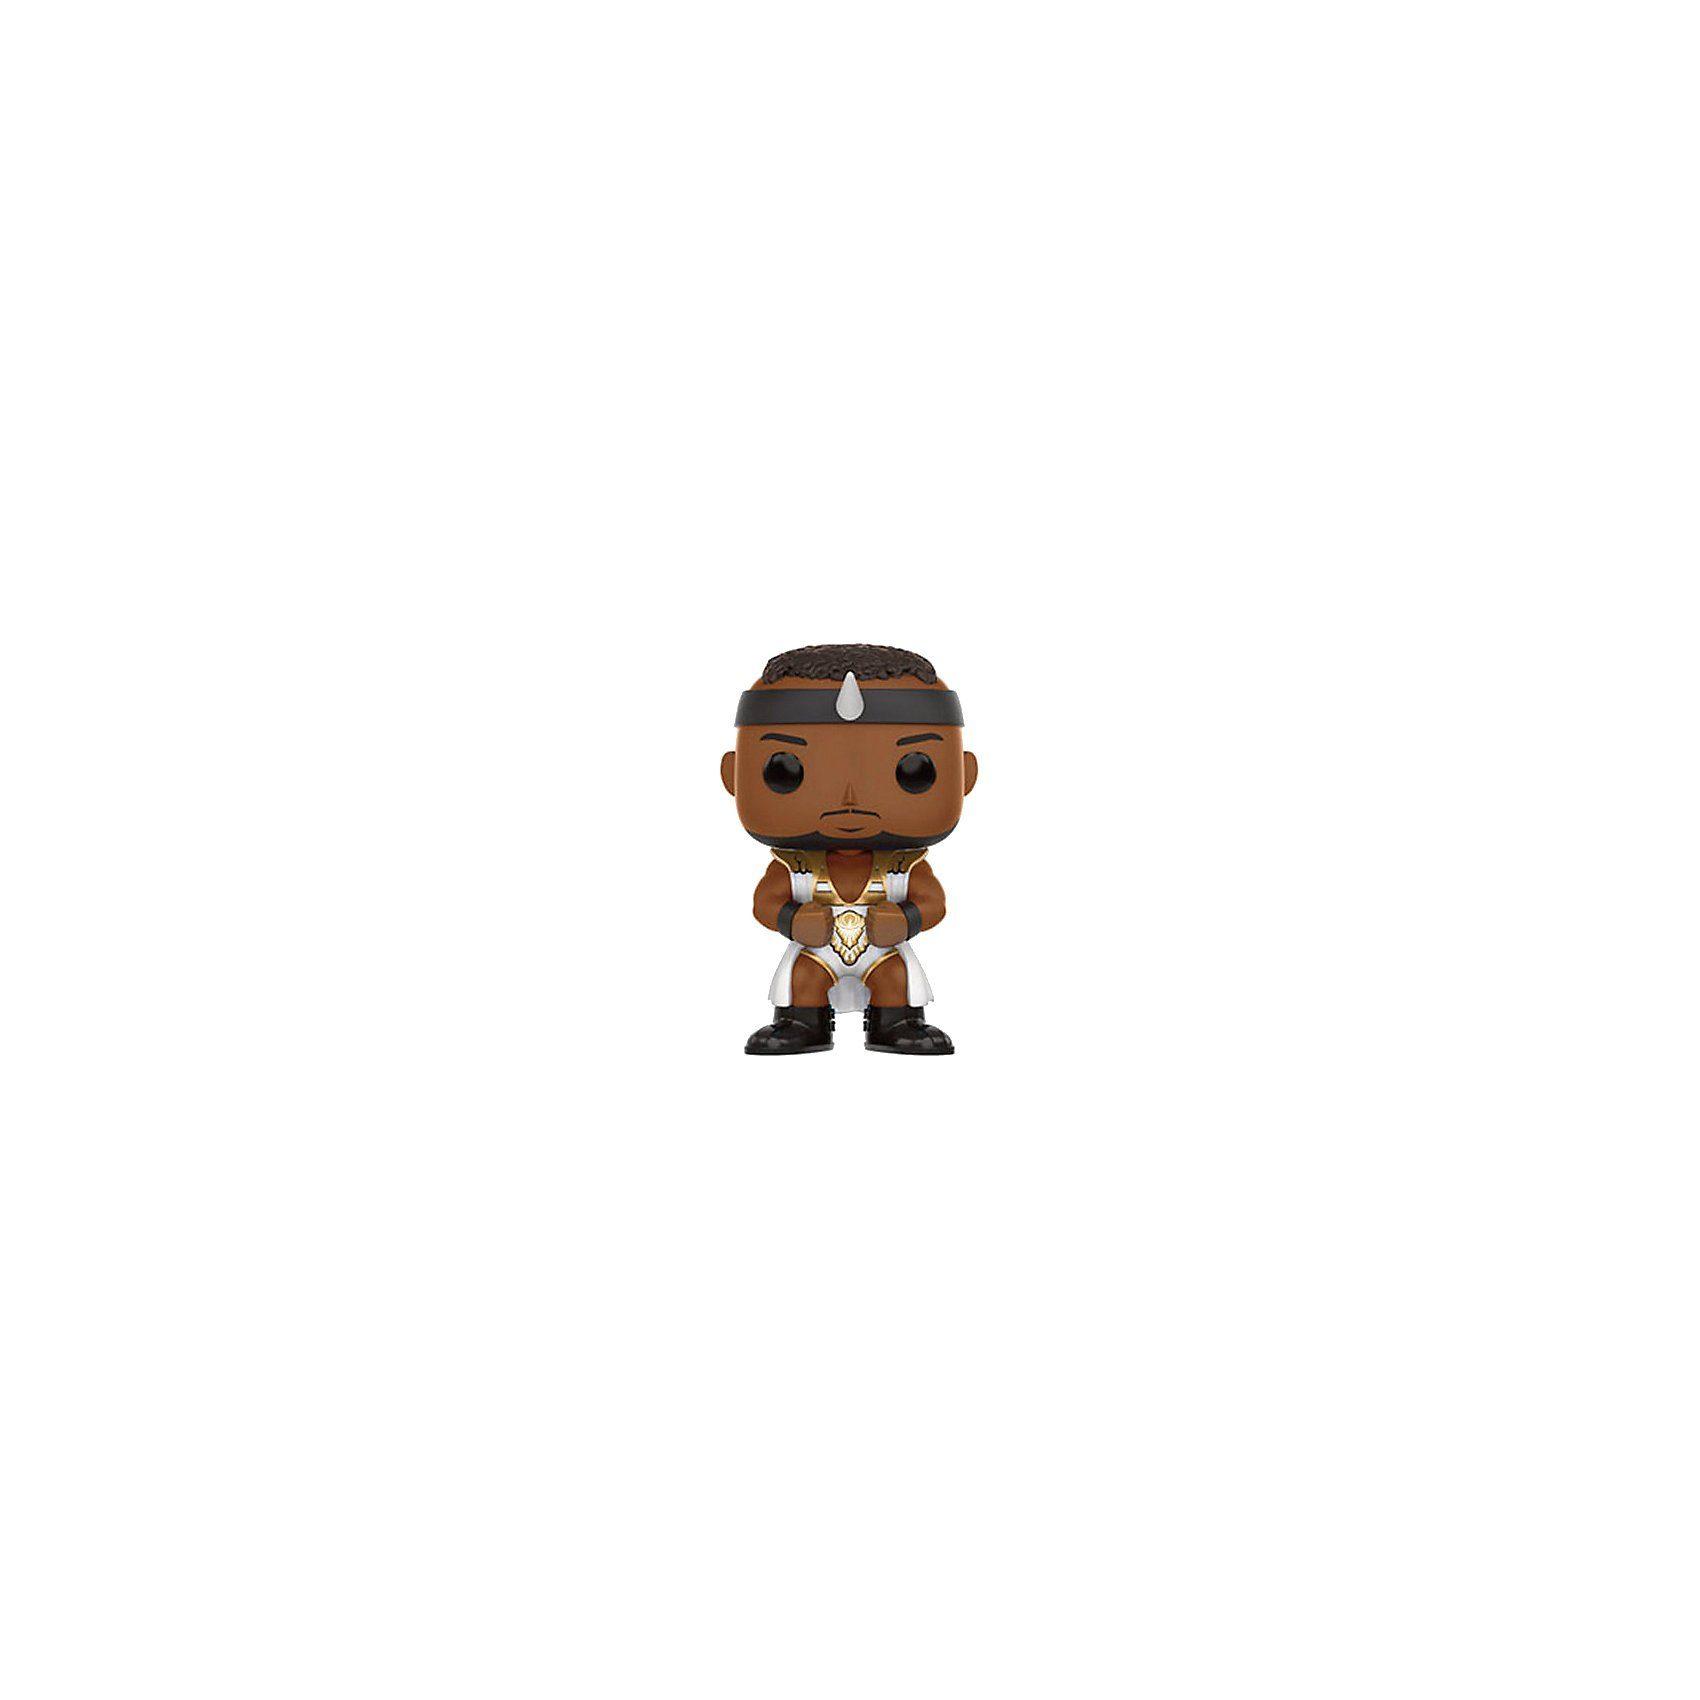 Funko Pop! WWE - Sammelfigur Big E